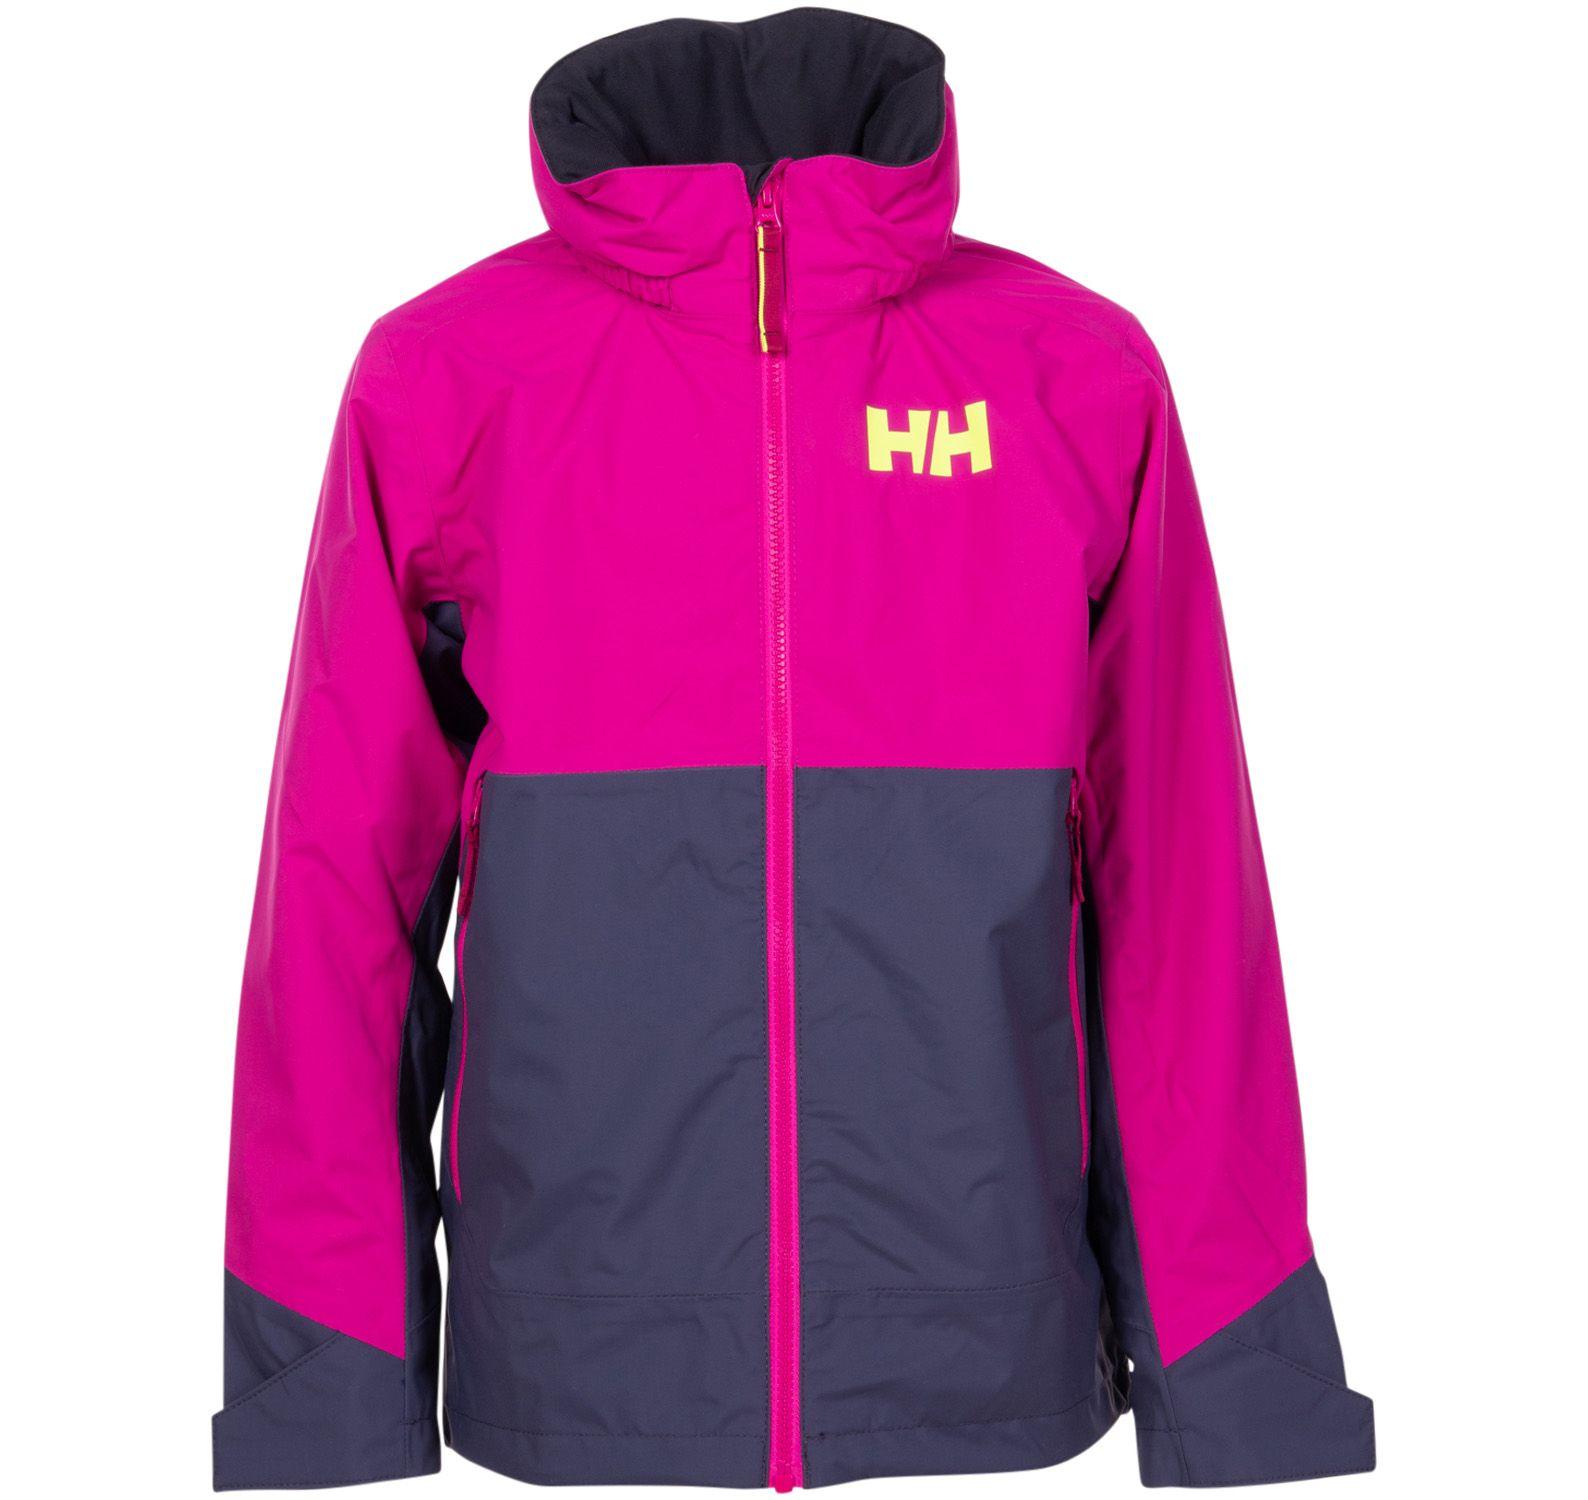 jr ascent jacket, 151 very berry, 140